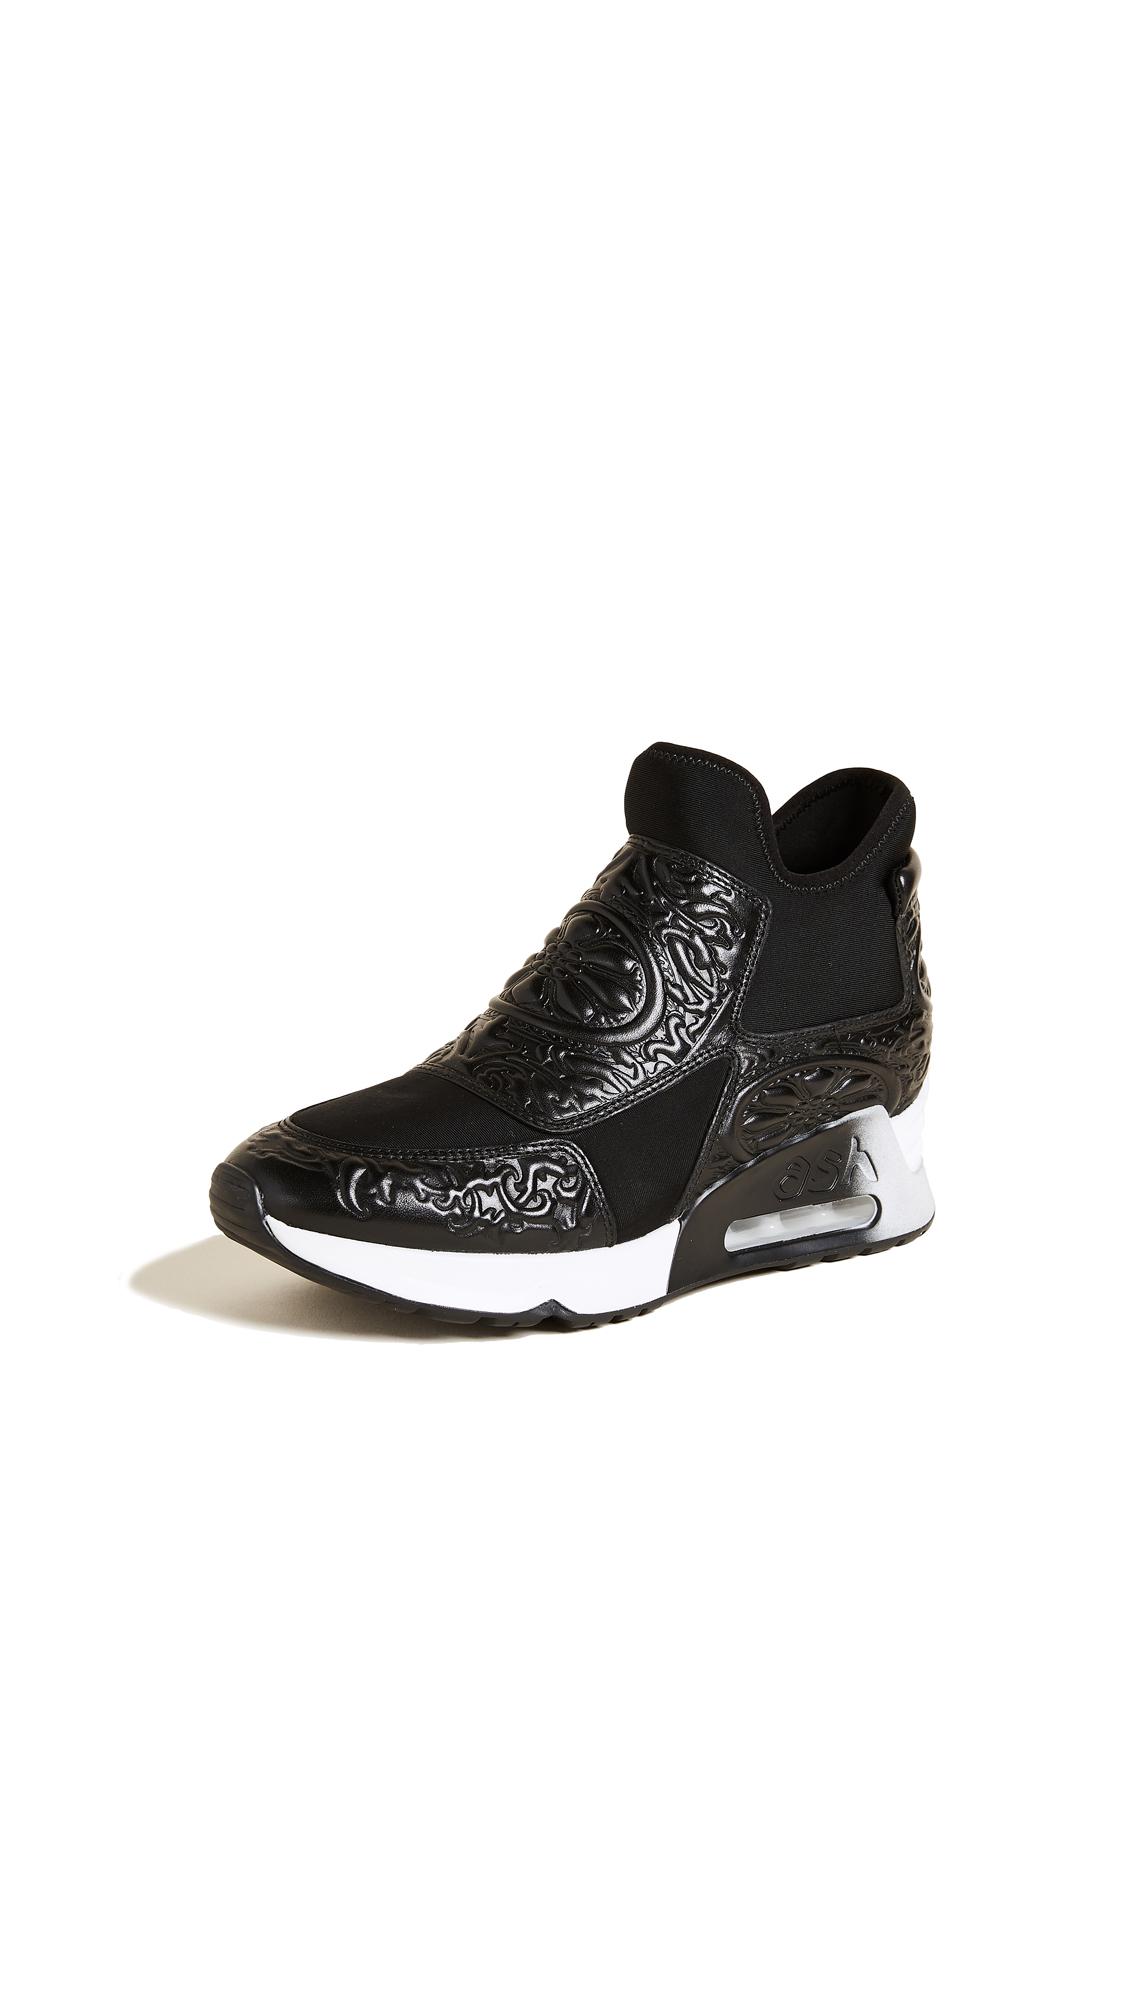 Ash Lexi Sneakers - Black/Black